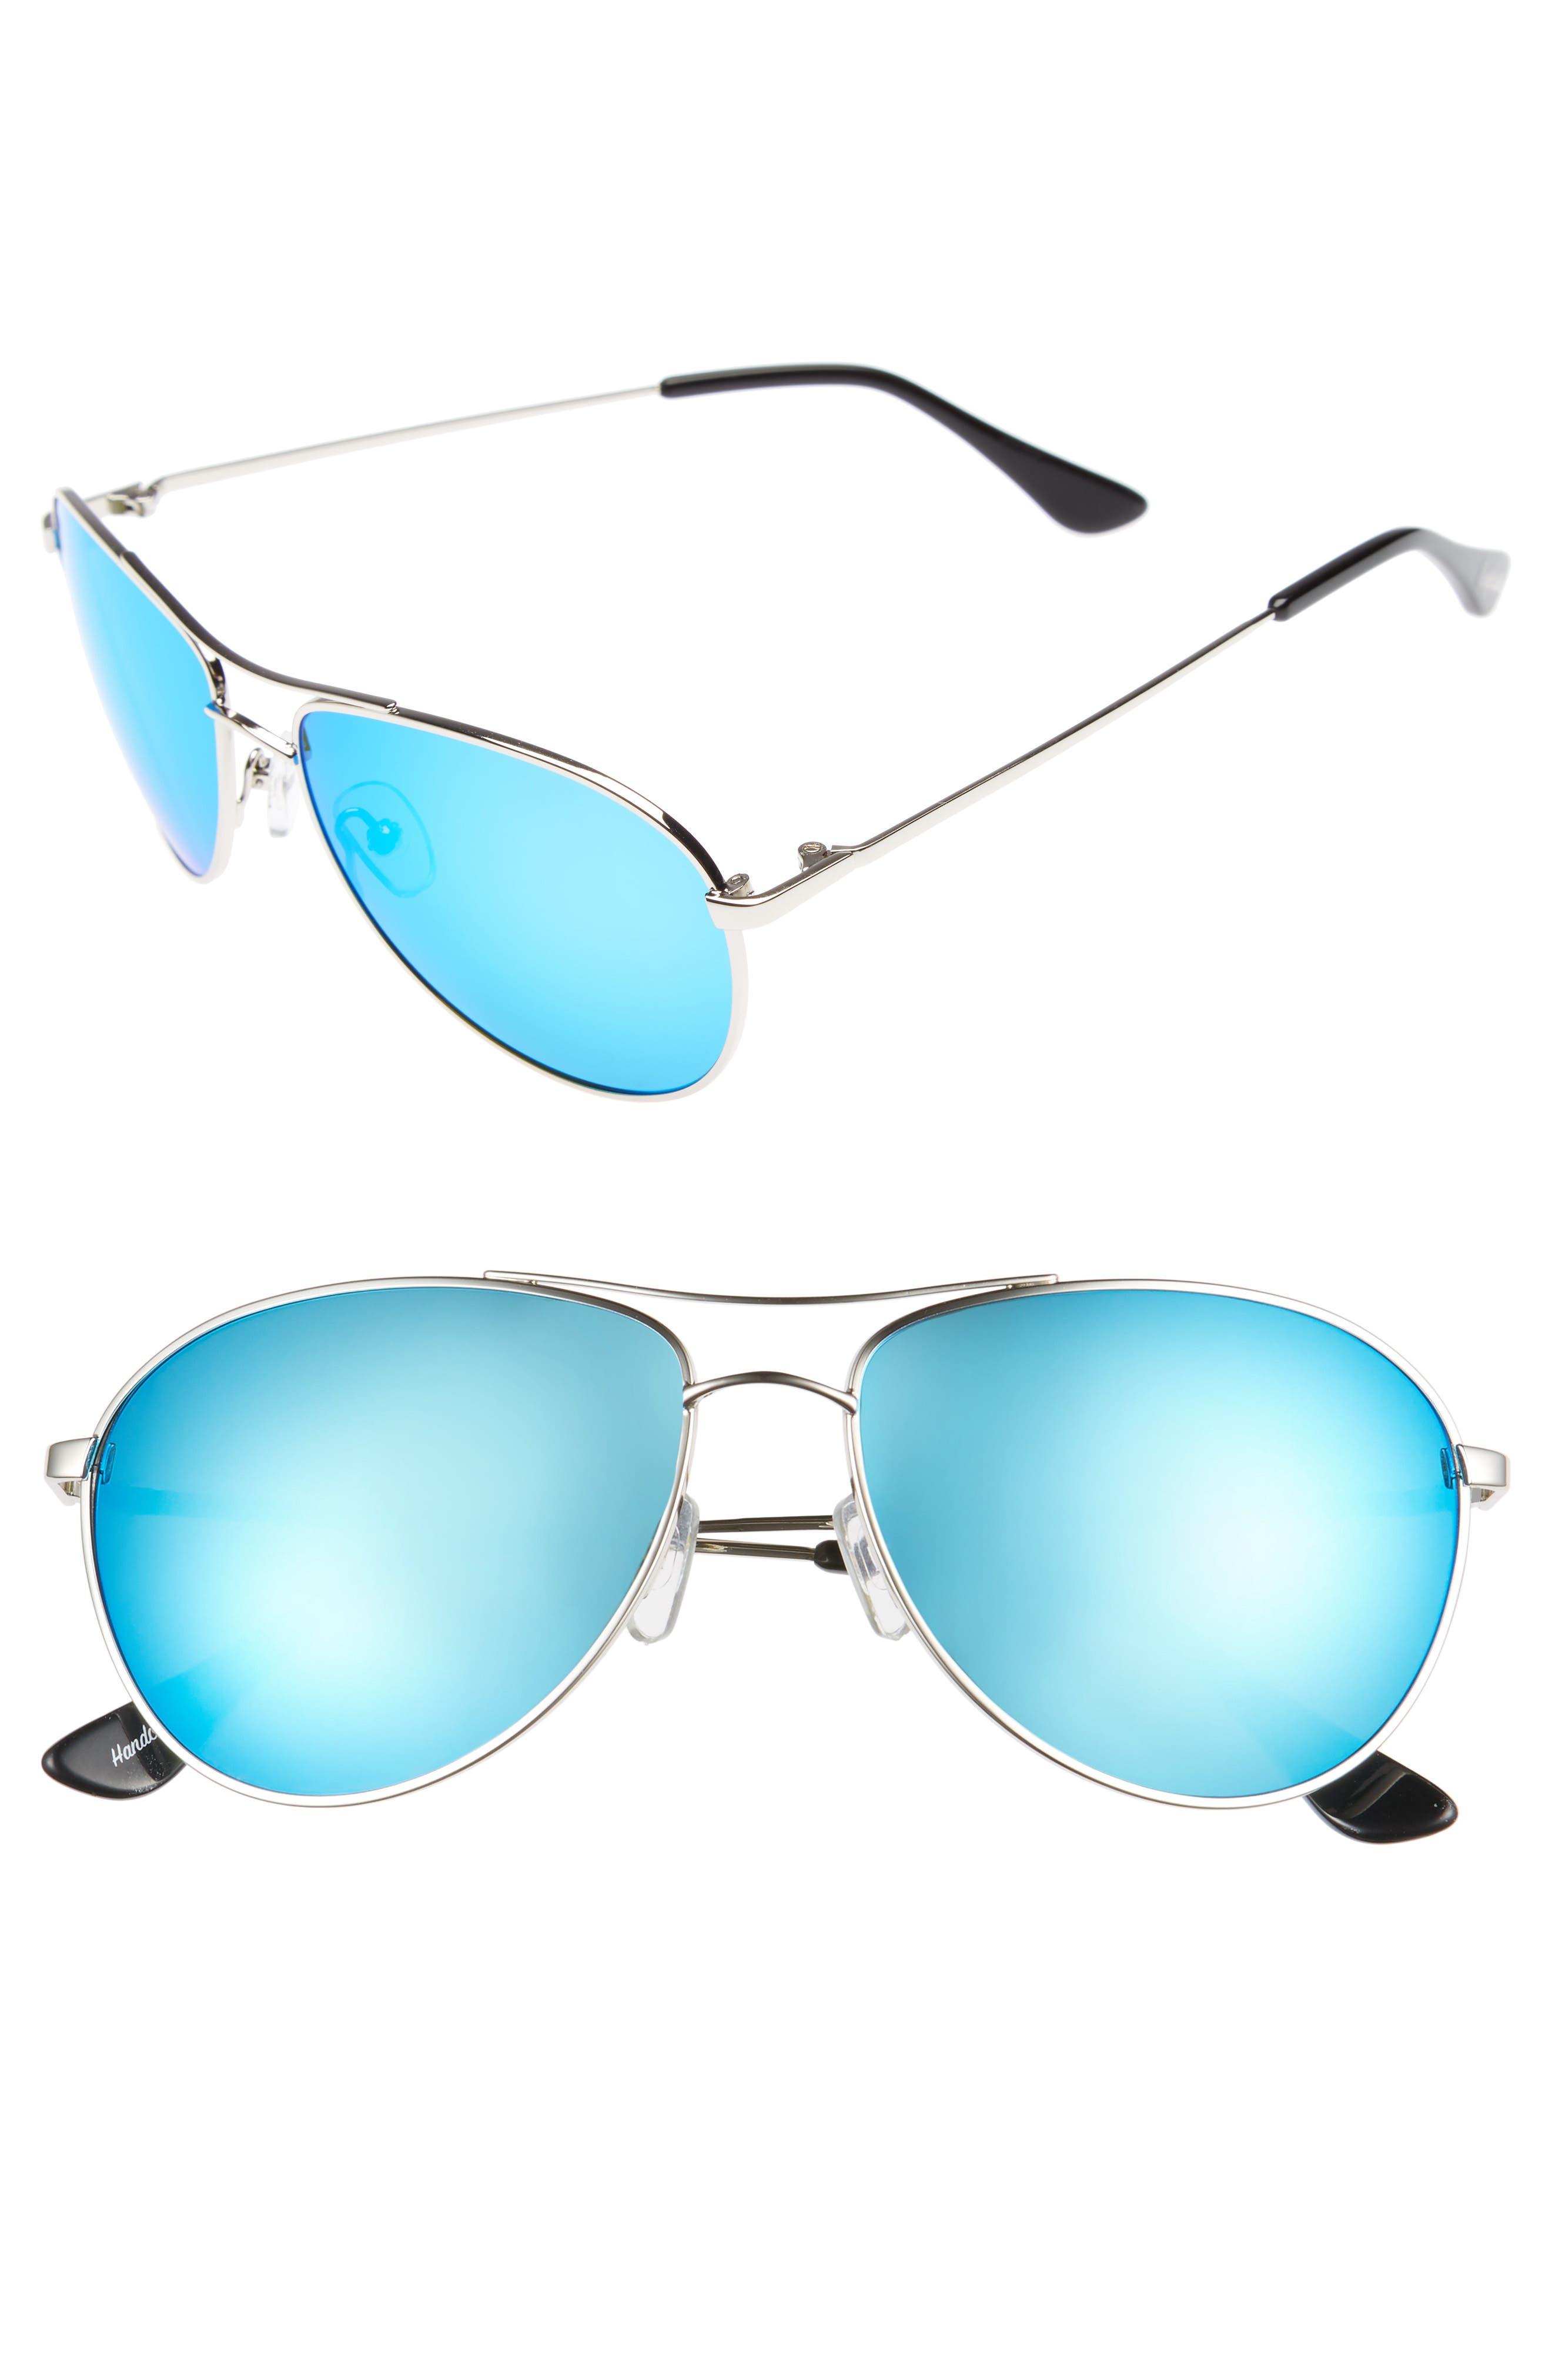 Orville 58mm Mirrored Aviator Sunglasses,                             Main thumbnail 1, color,                             Silver/ Blue Polar